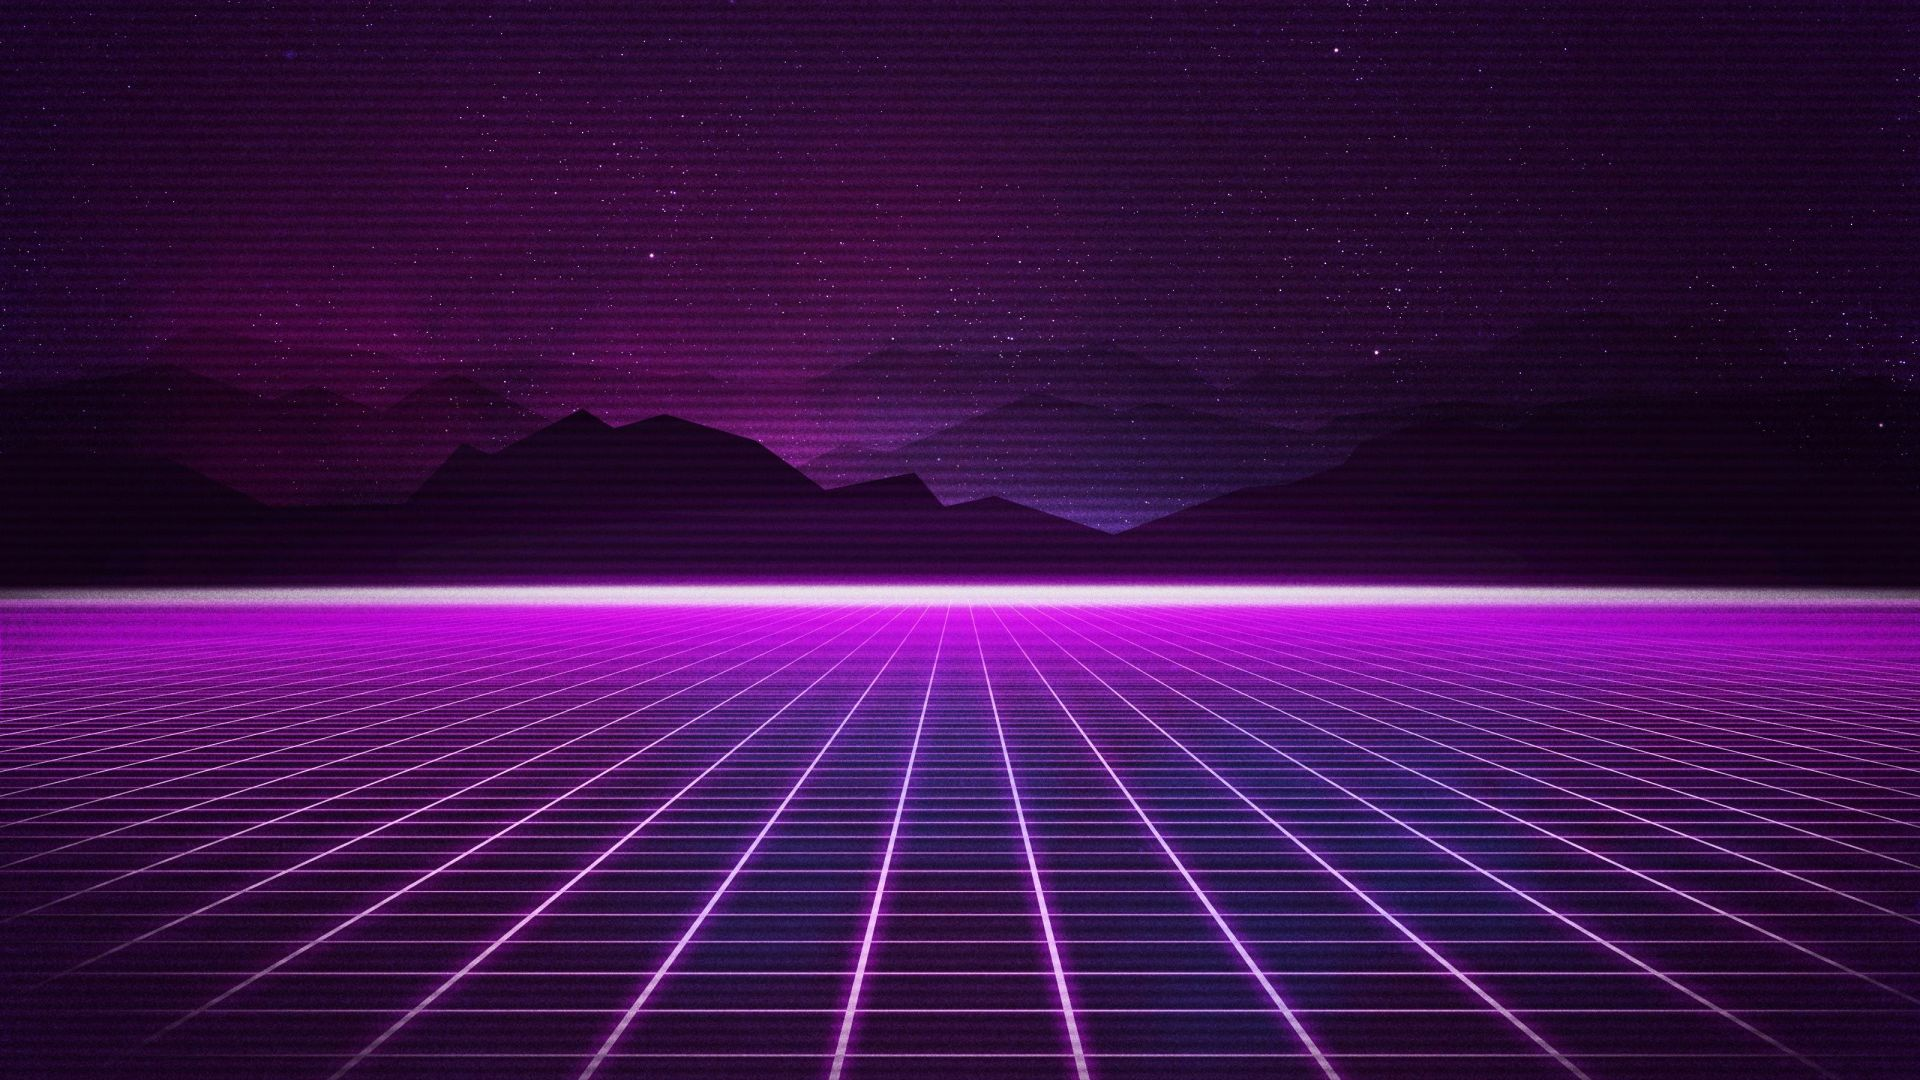 Wallpaper Retrowave, Purple, lines, 4K, Art #18921